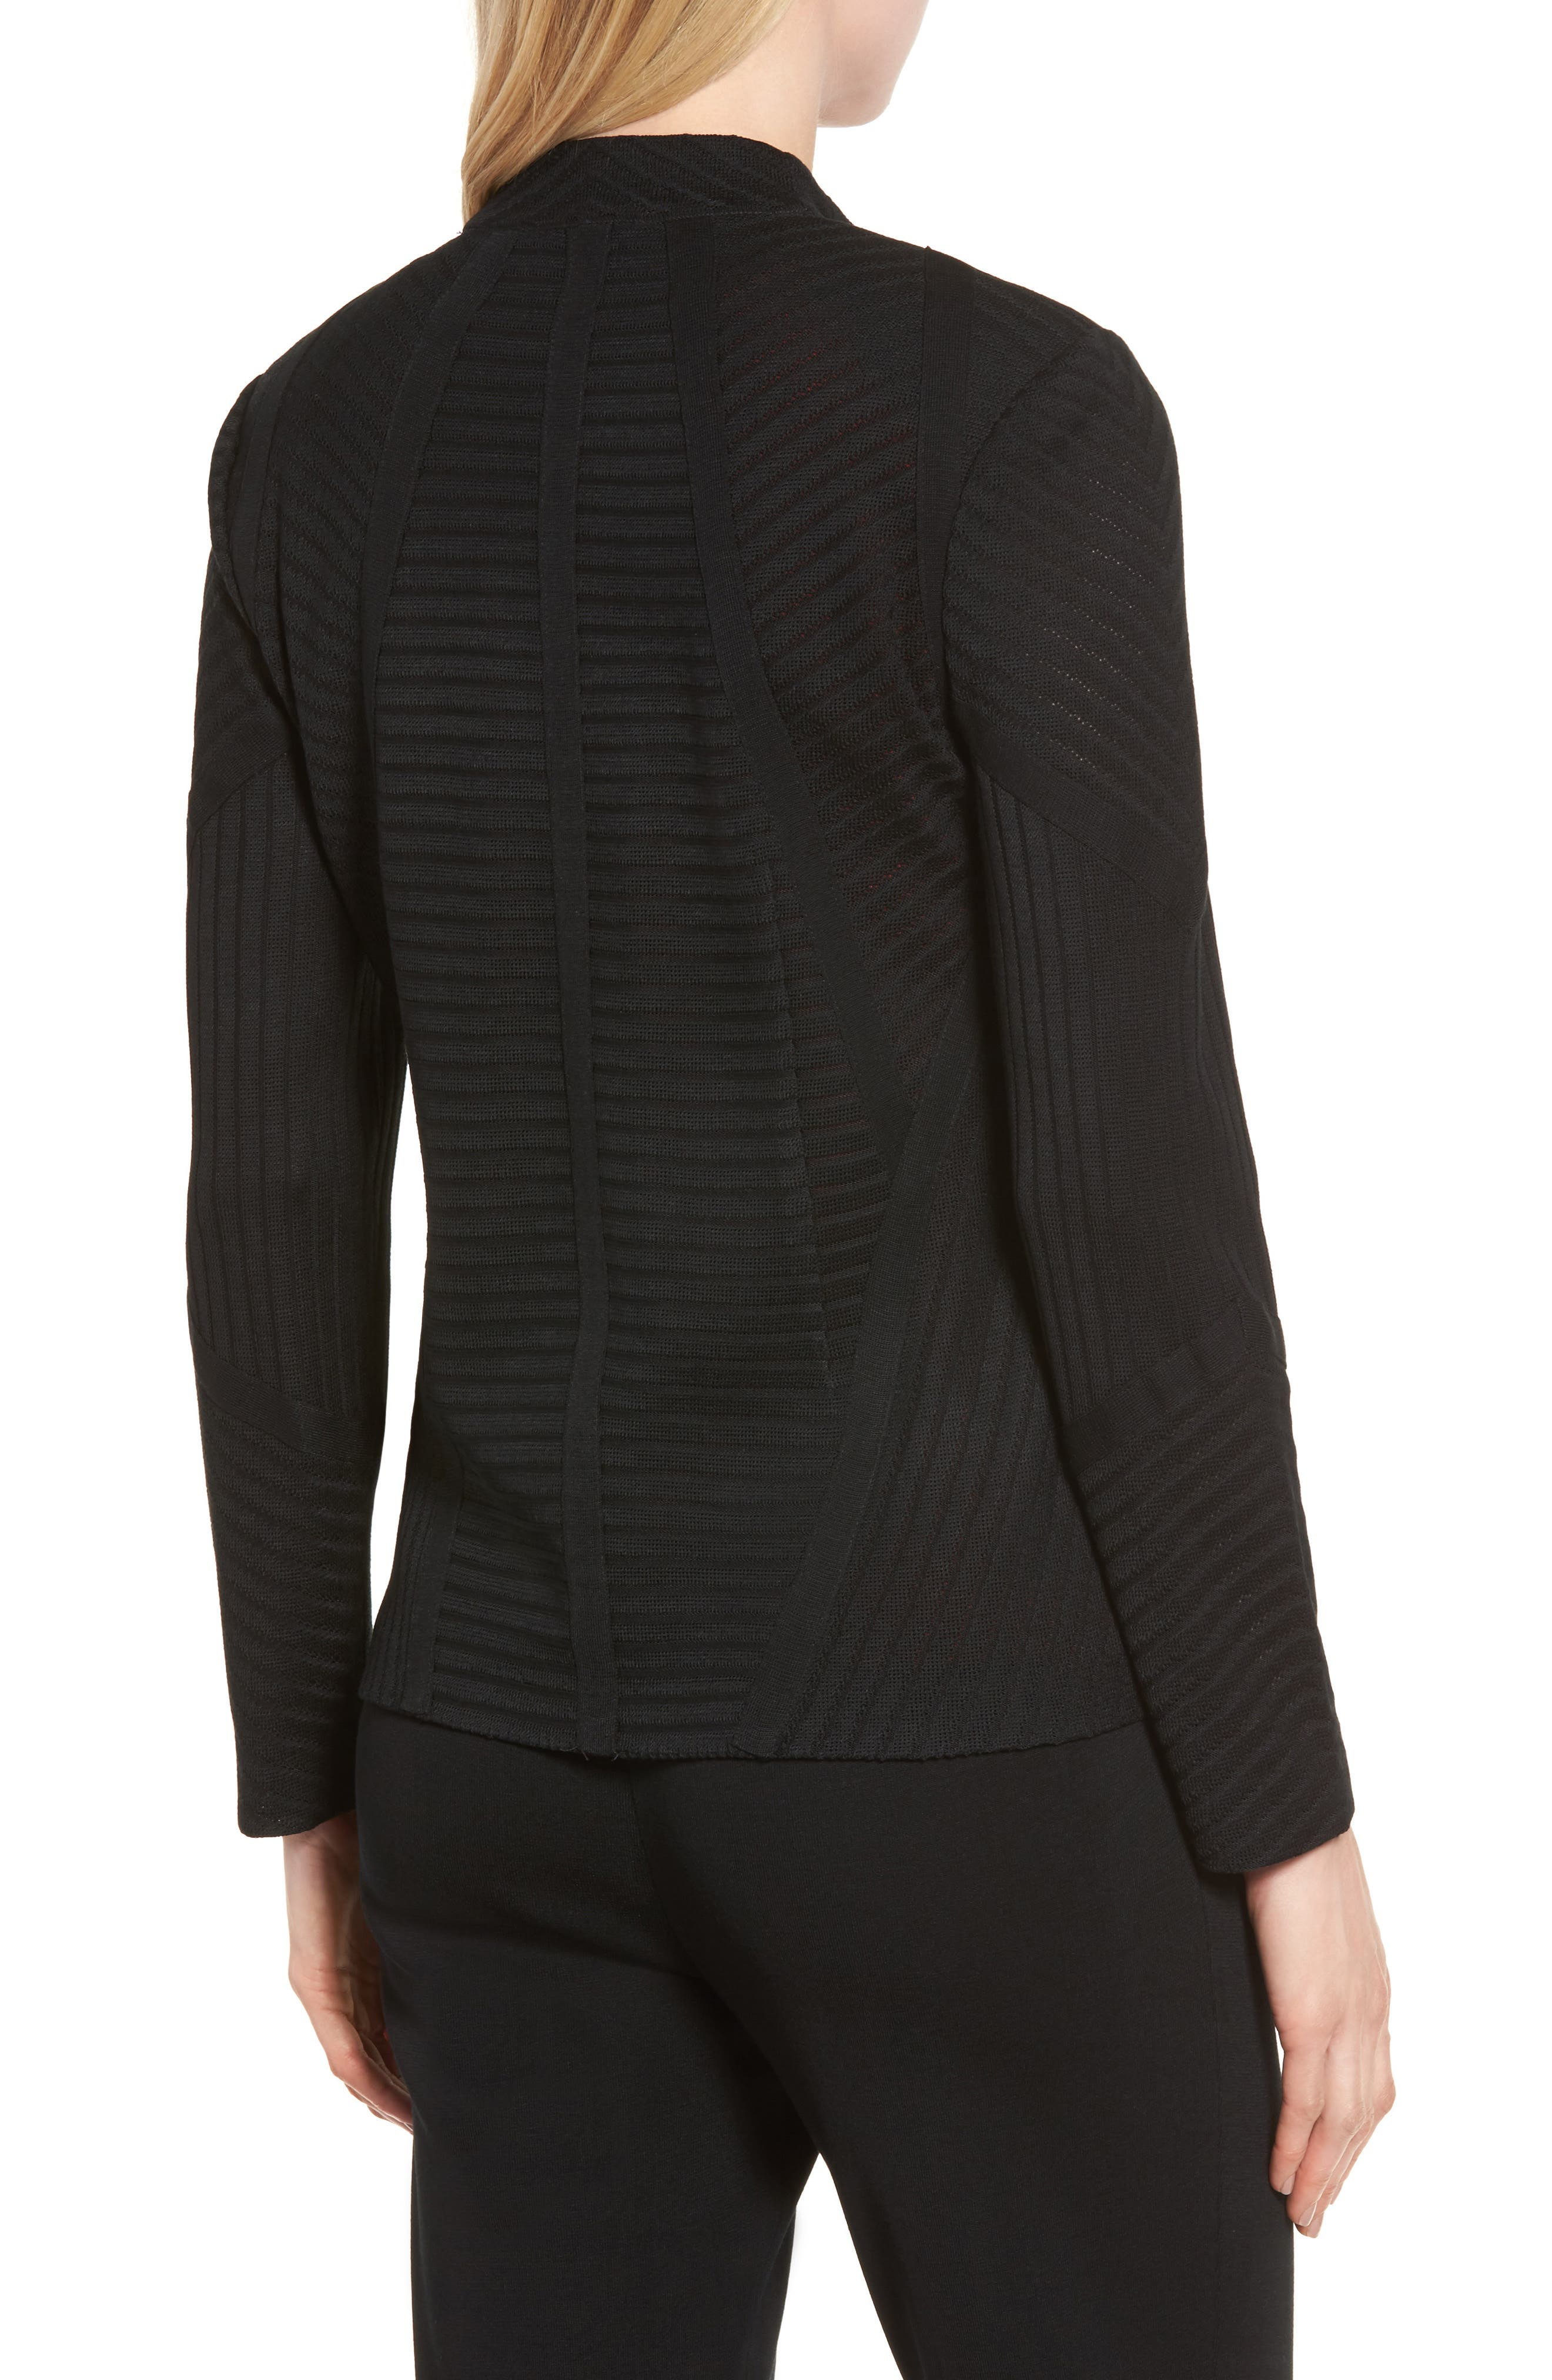 Alternate Image 2  - Ming Wang Striped Knit Jacket